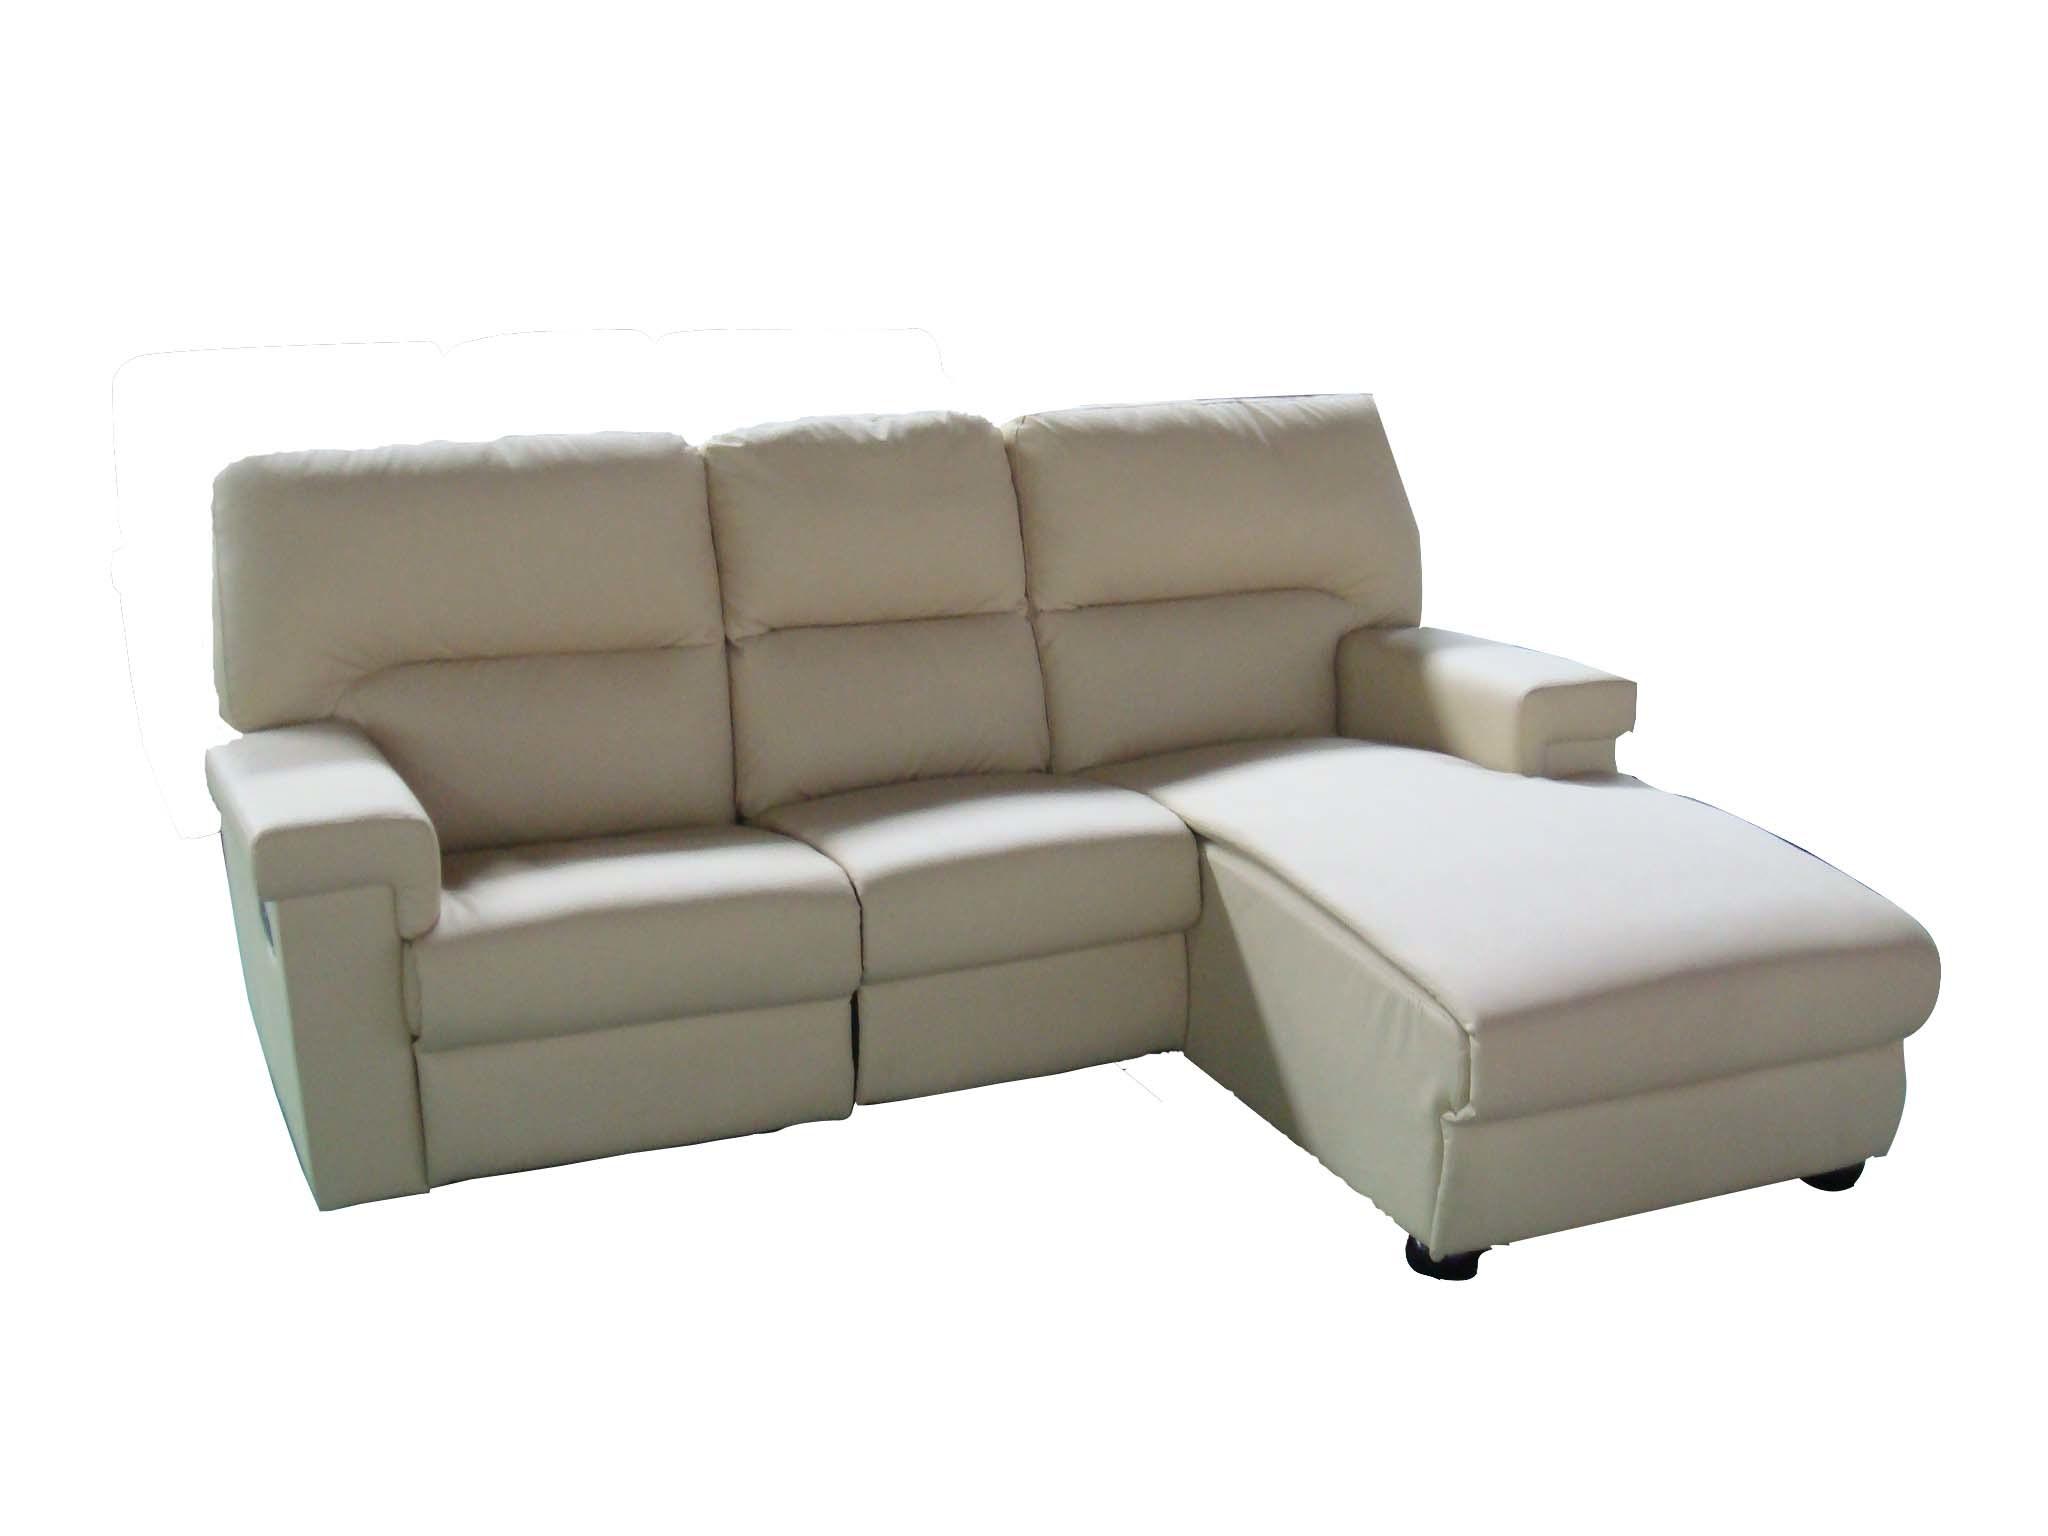 contemporary leather sofa microfiber sleeper sectional designer design